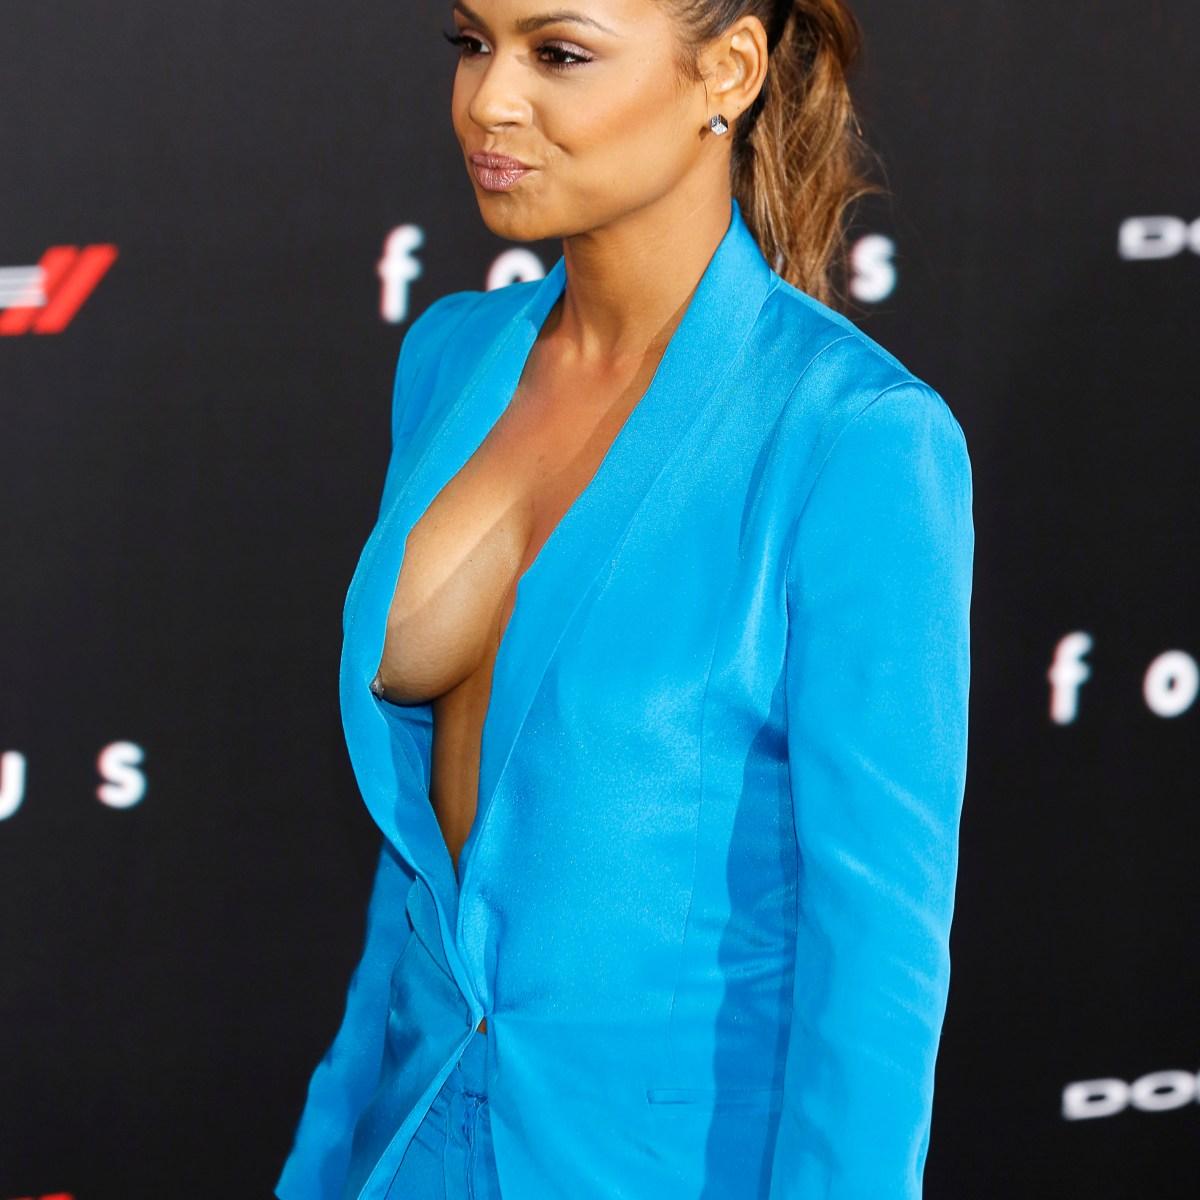 Hollywood Actress Nip Slip photo 17